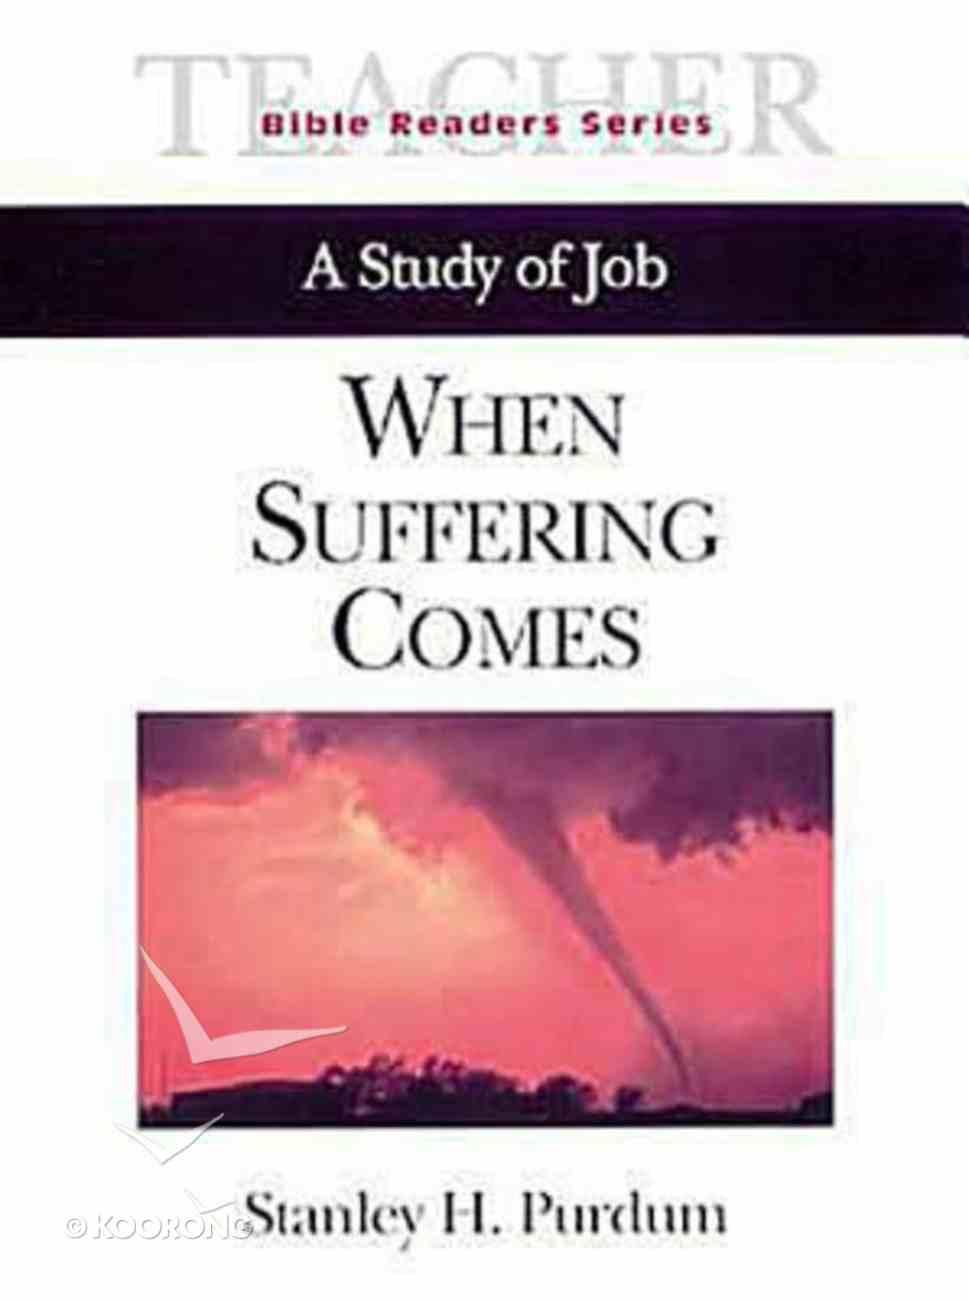 When Suffering Comes (Teacher's Guide) (Abingdon Bible Reader Series) Paperback